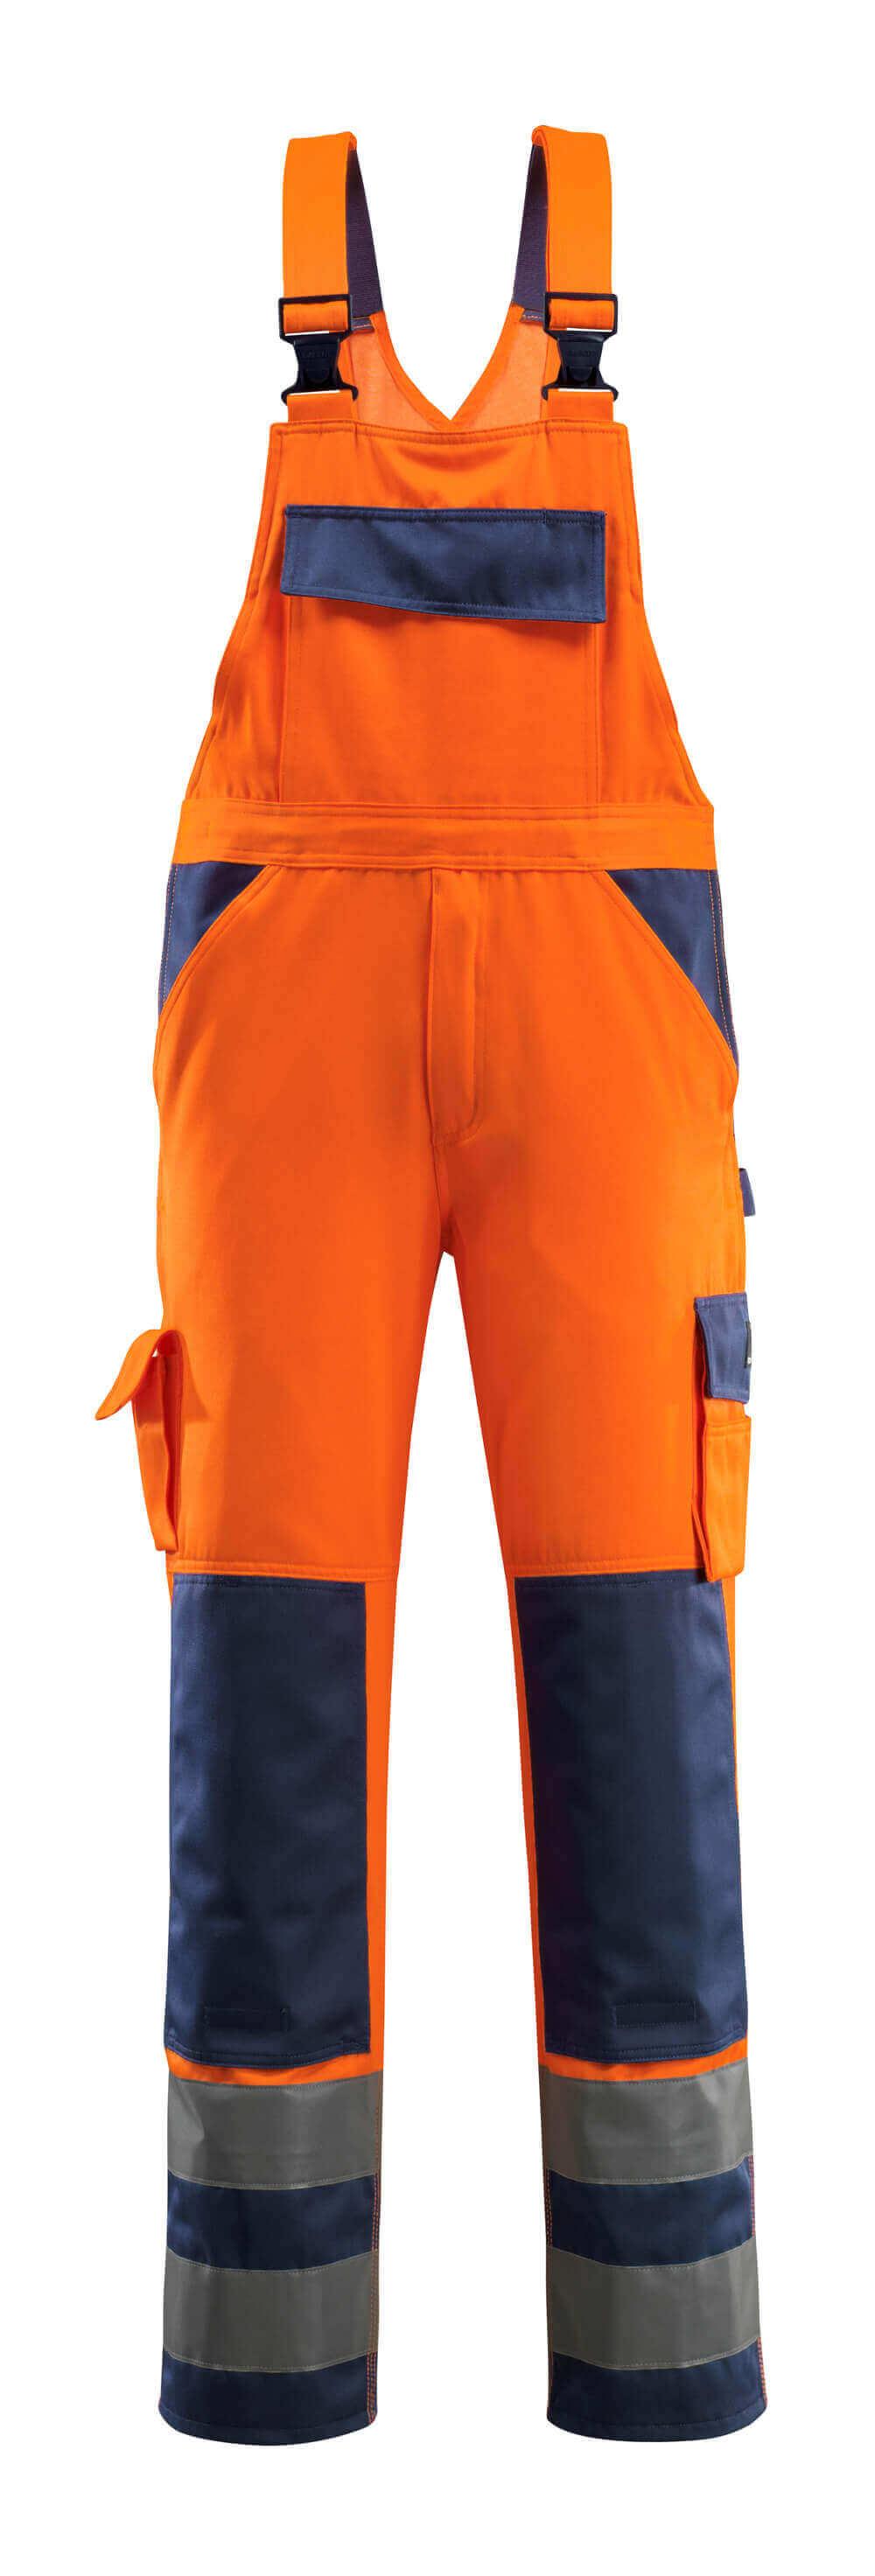 07169-860-141 Arbeitslatzhose - hi-vis Orange/Marine